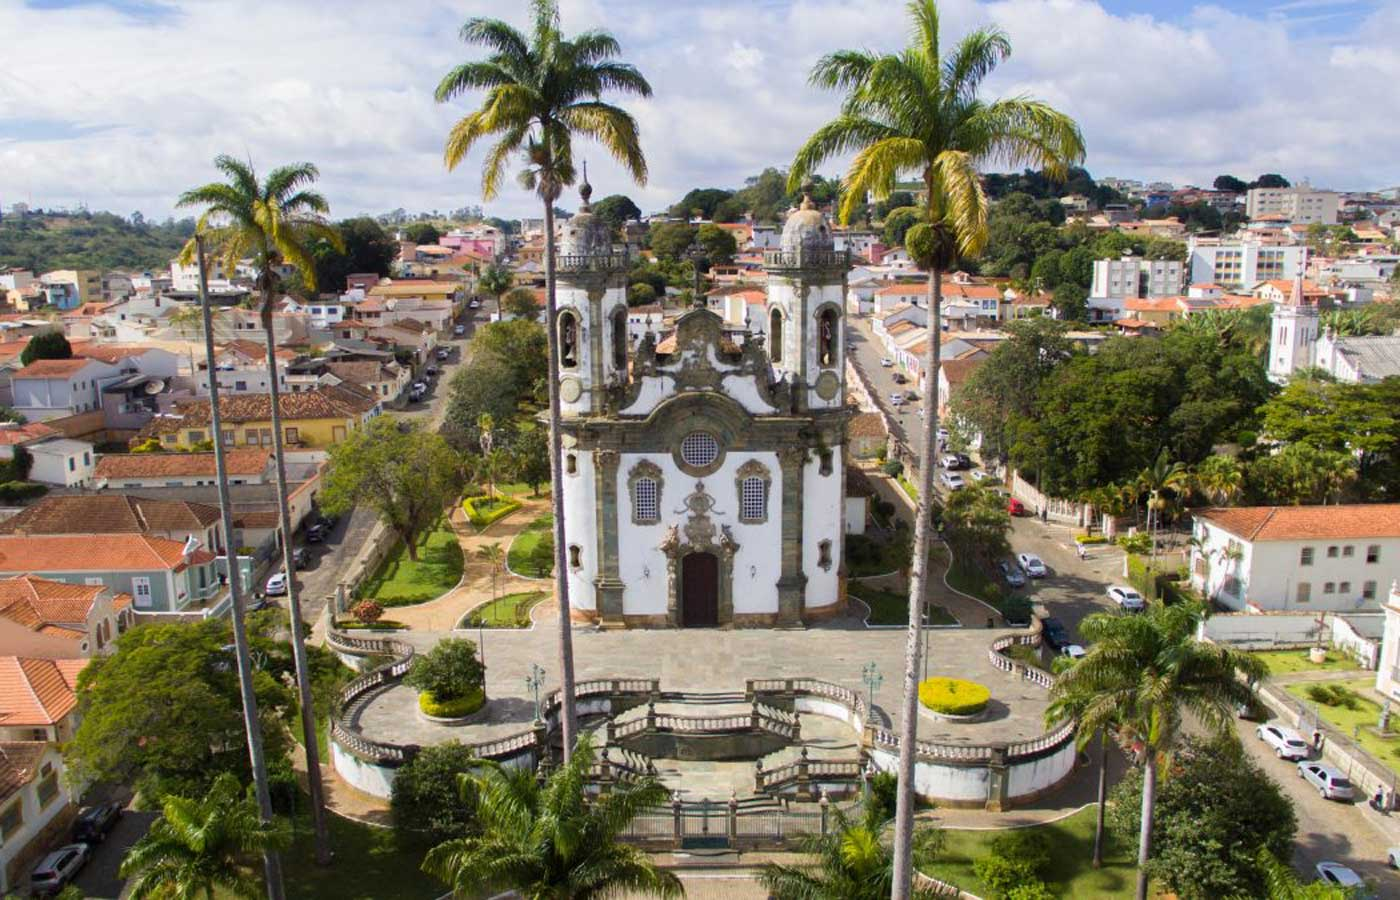 Sao Joao del Rey, Minas Gerais, Brazil